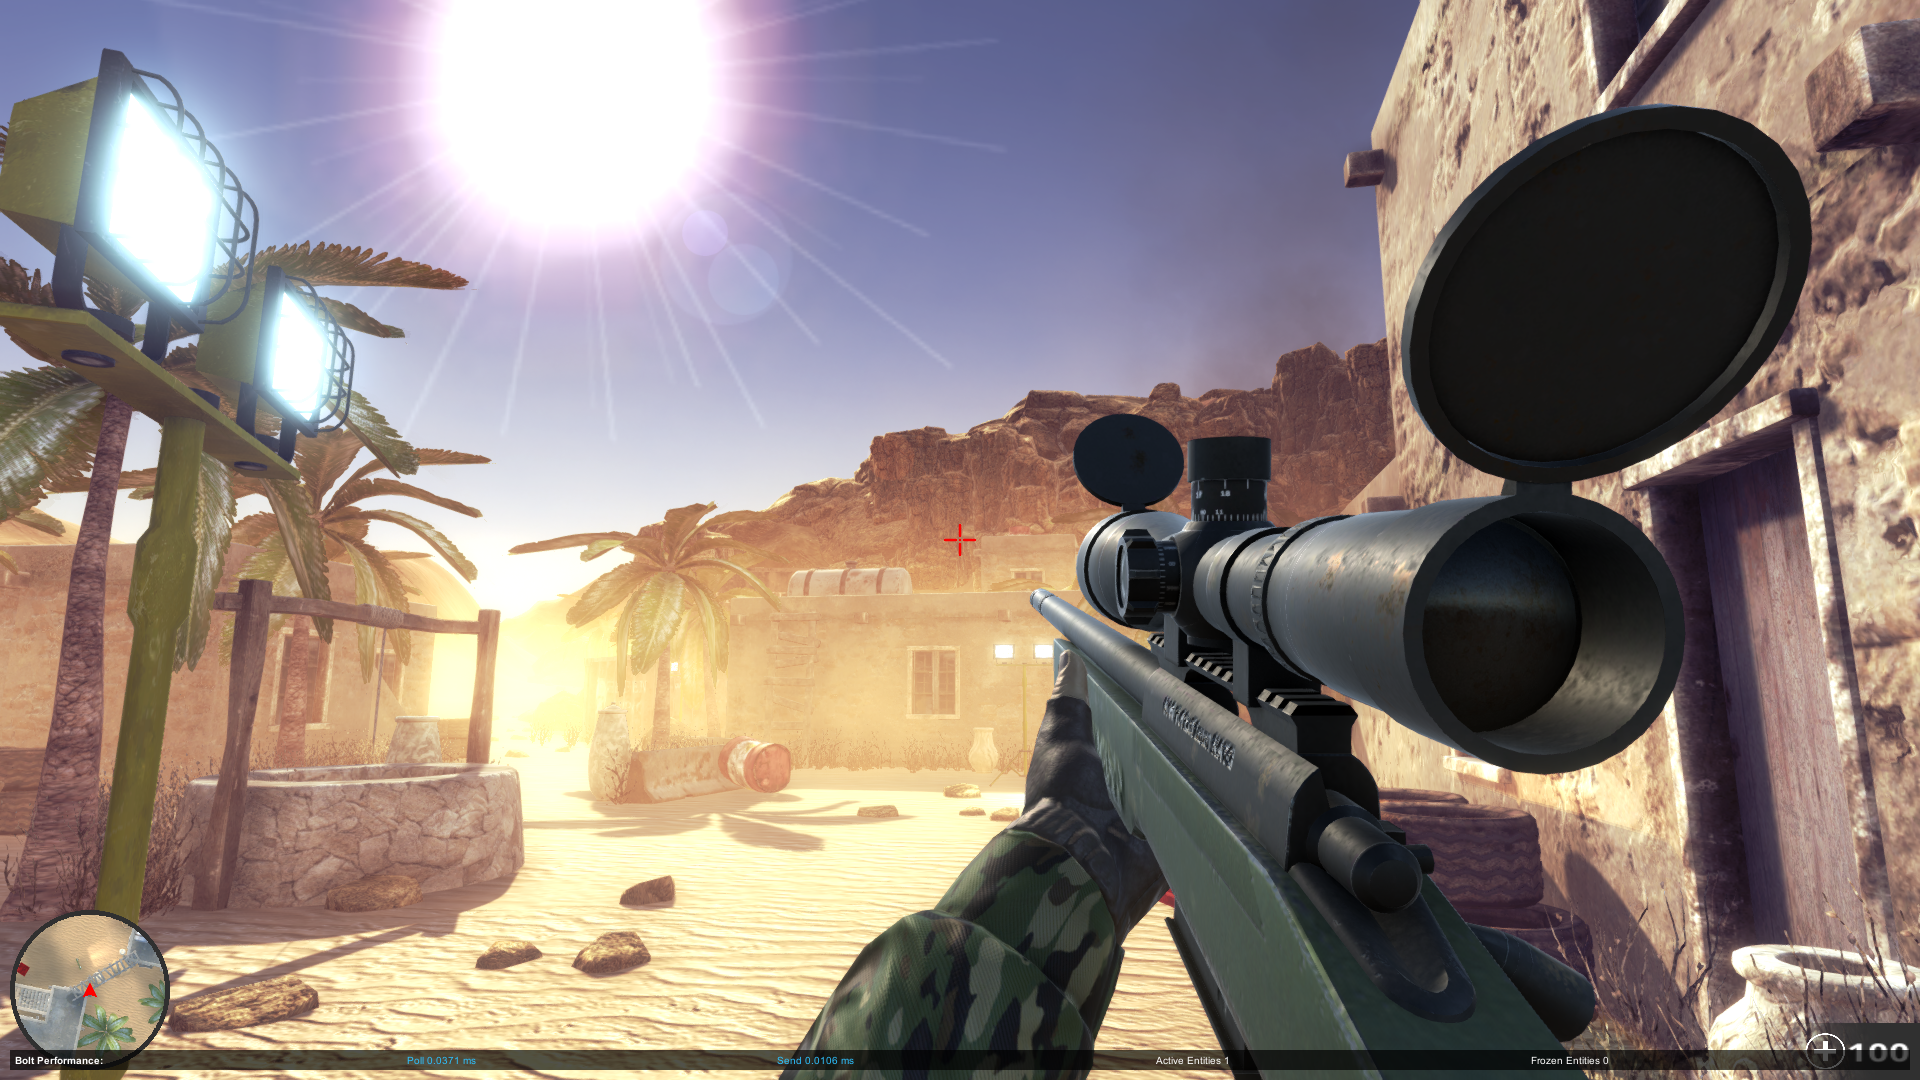 FPS Multiplayer Game WIP v0.1